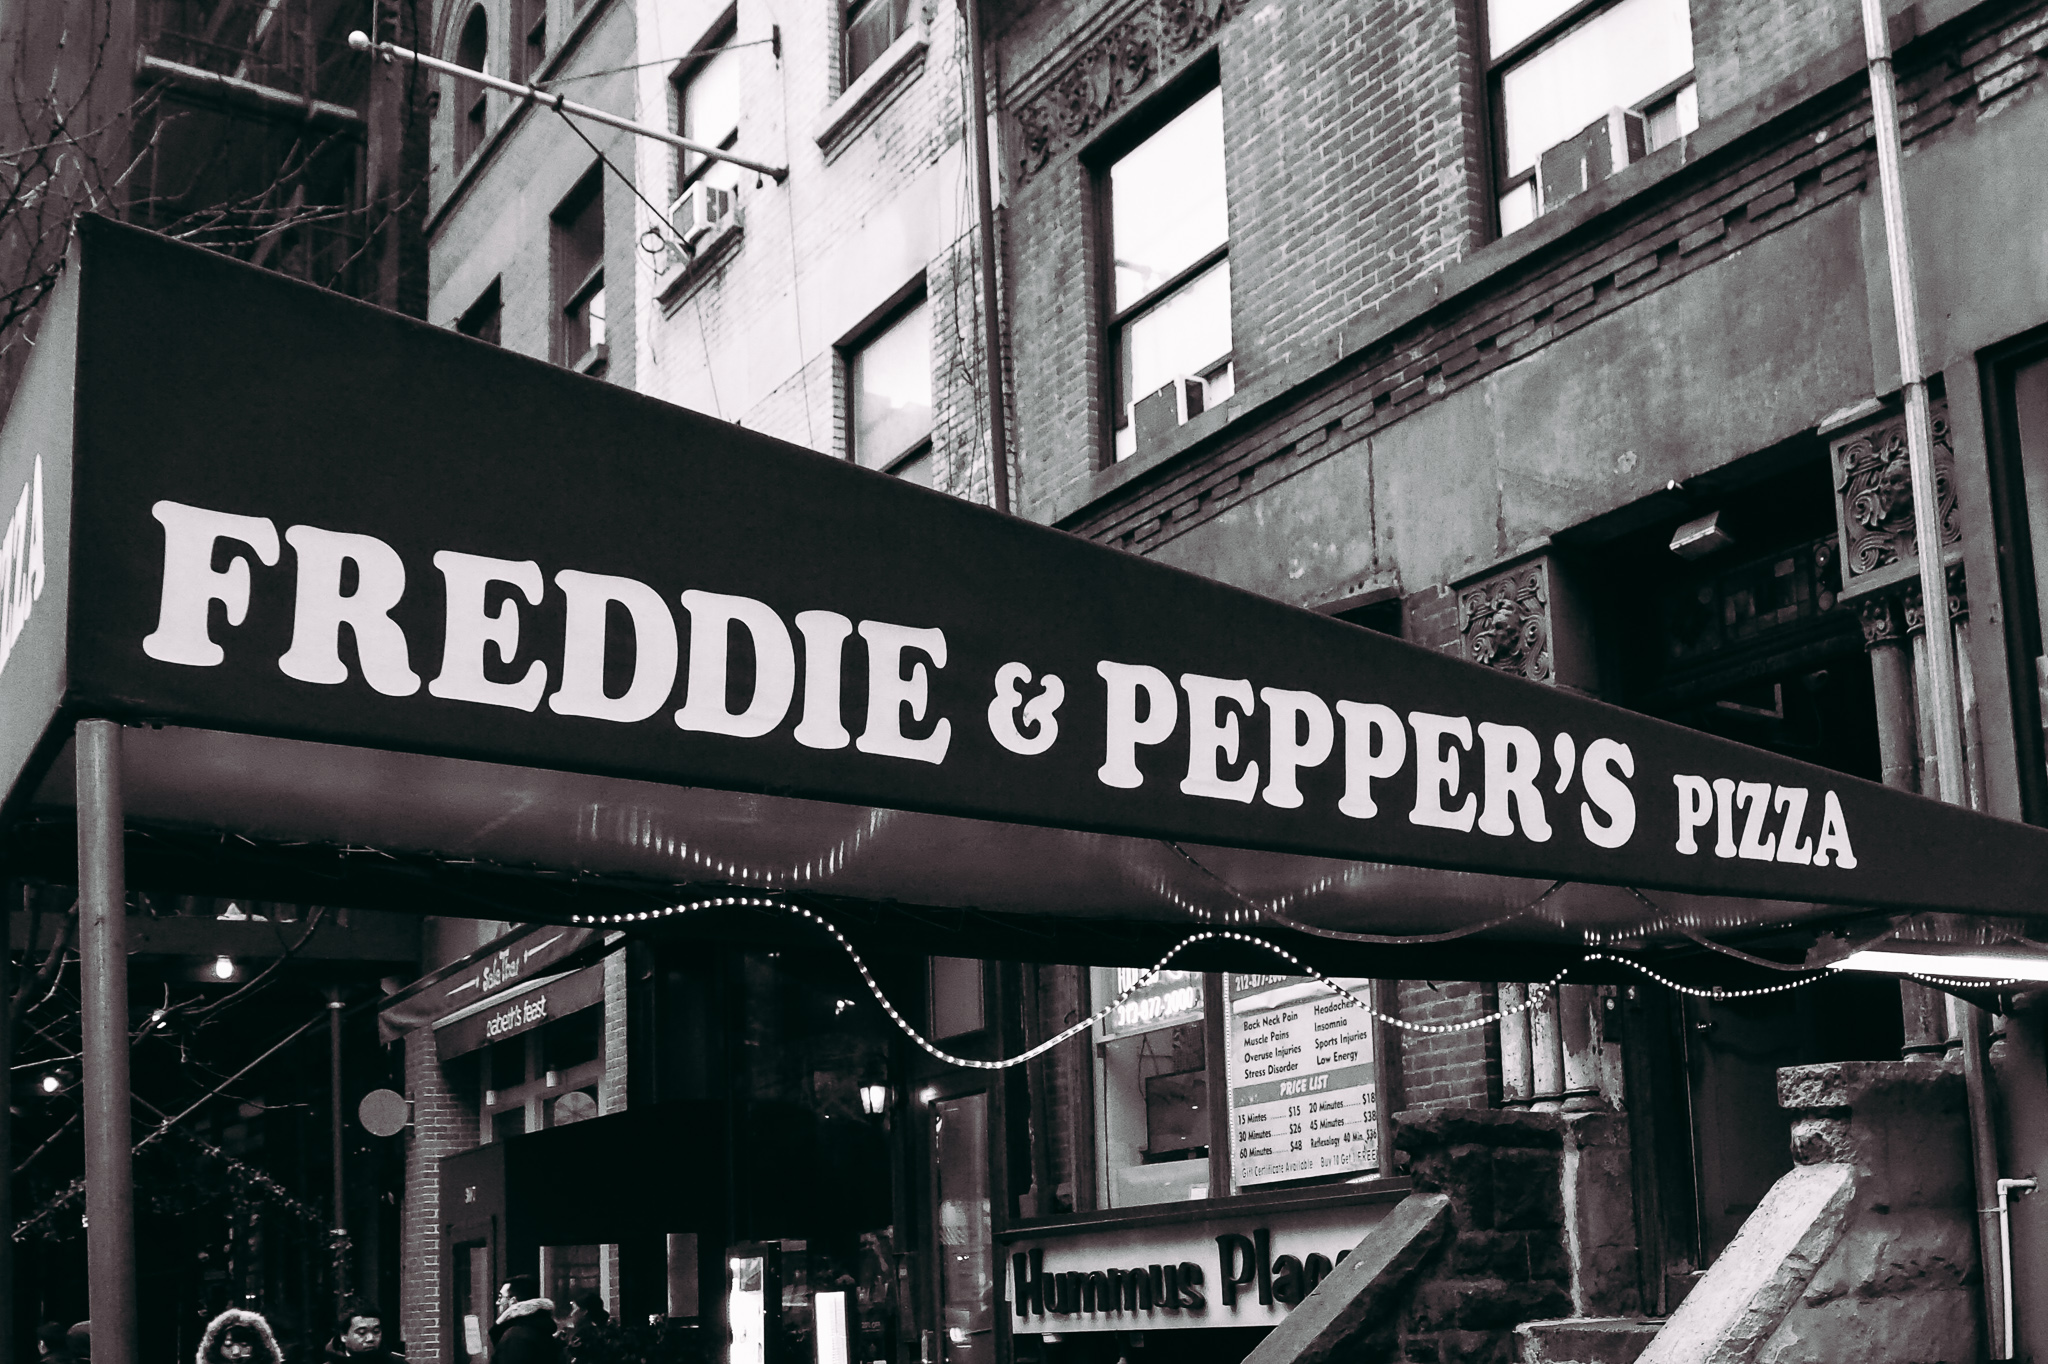 Freddie & Pepper's